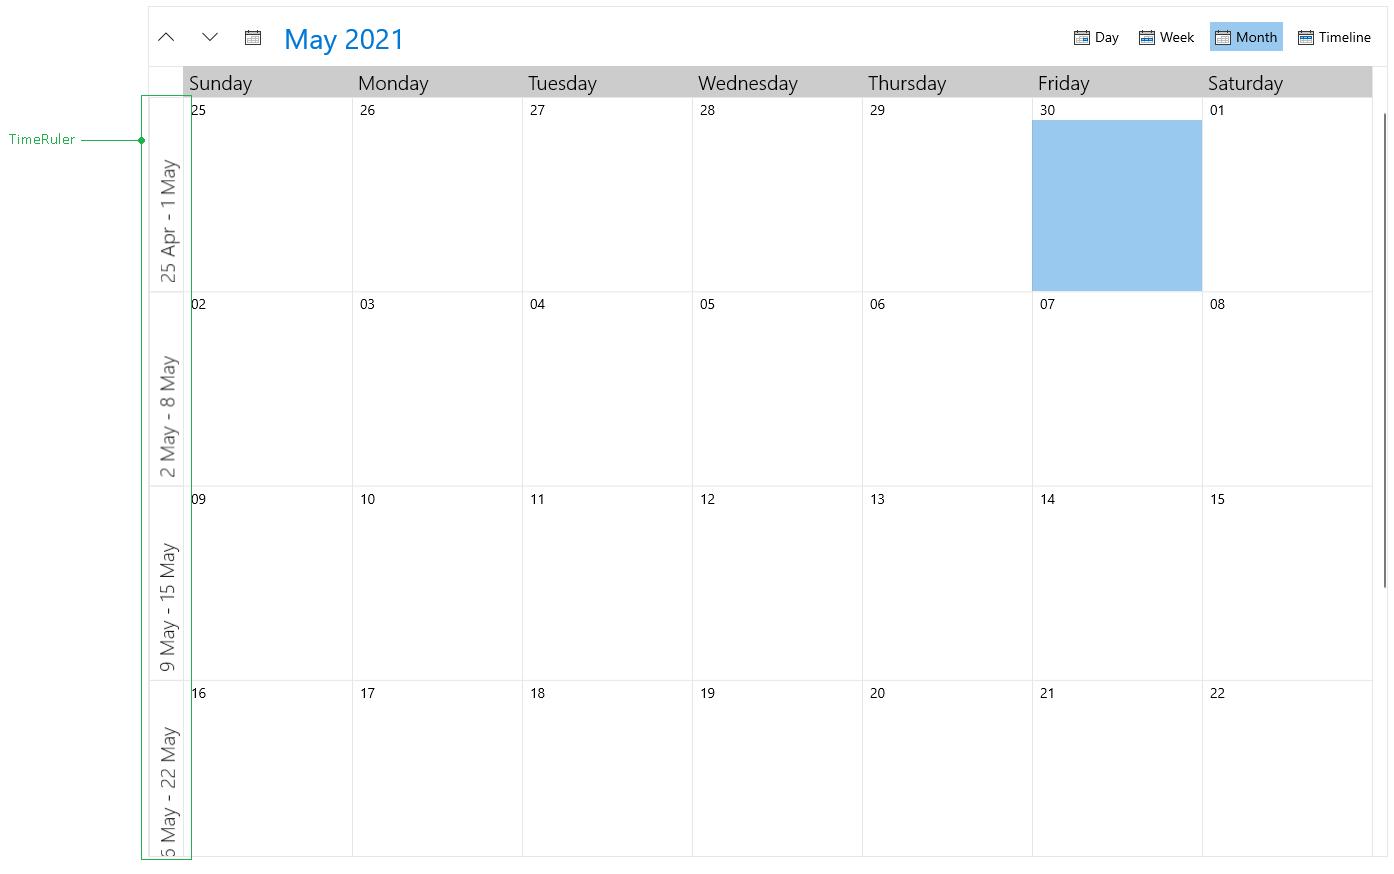 RadScheduler Time Ruler